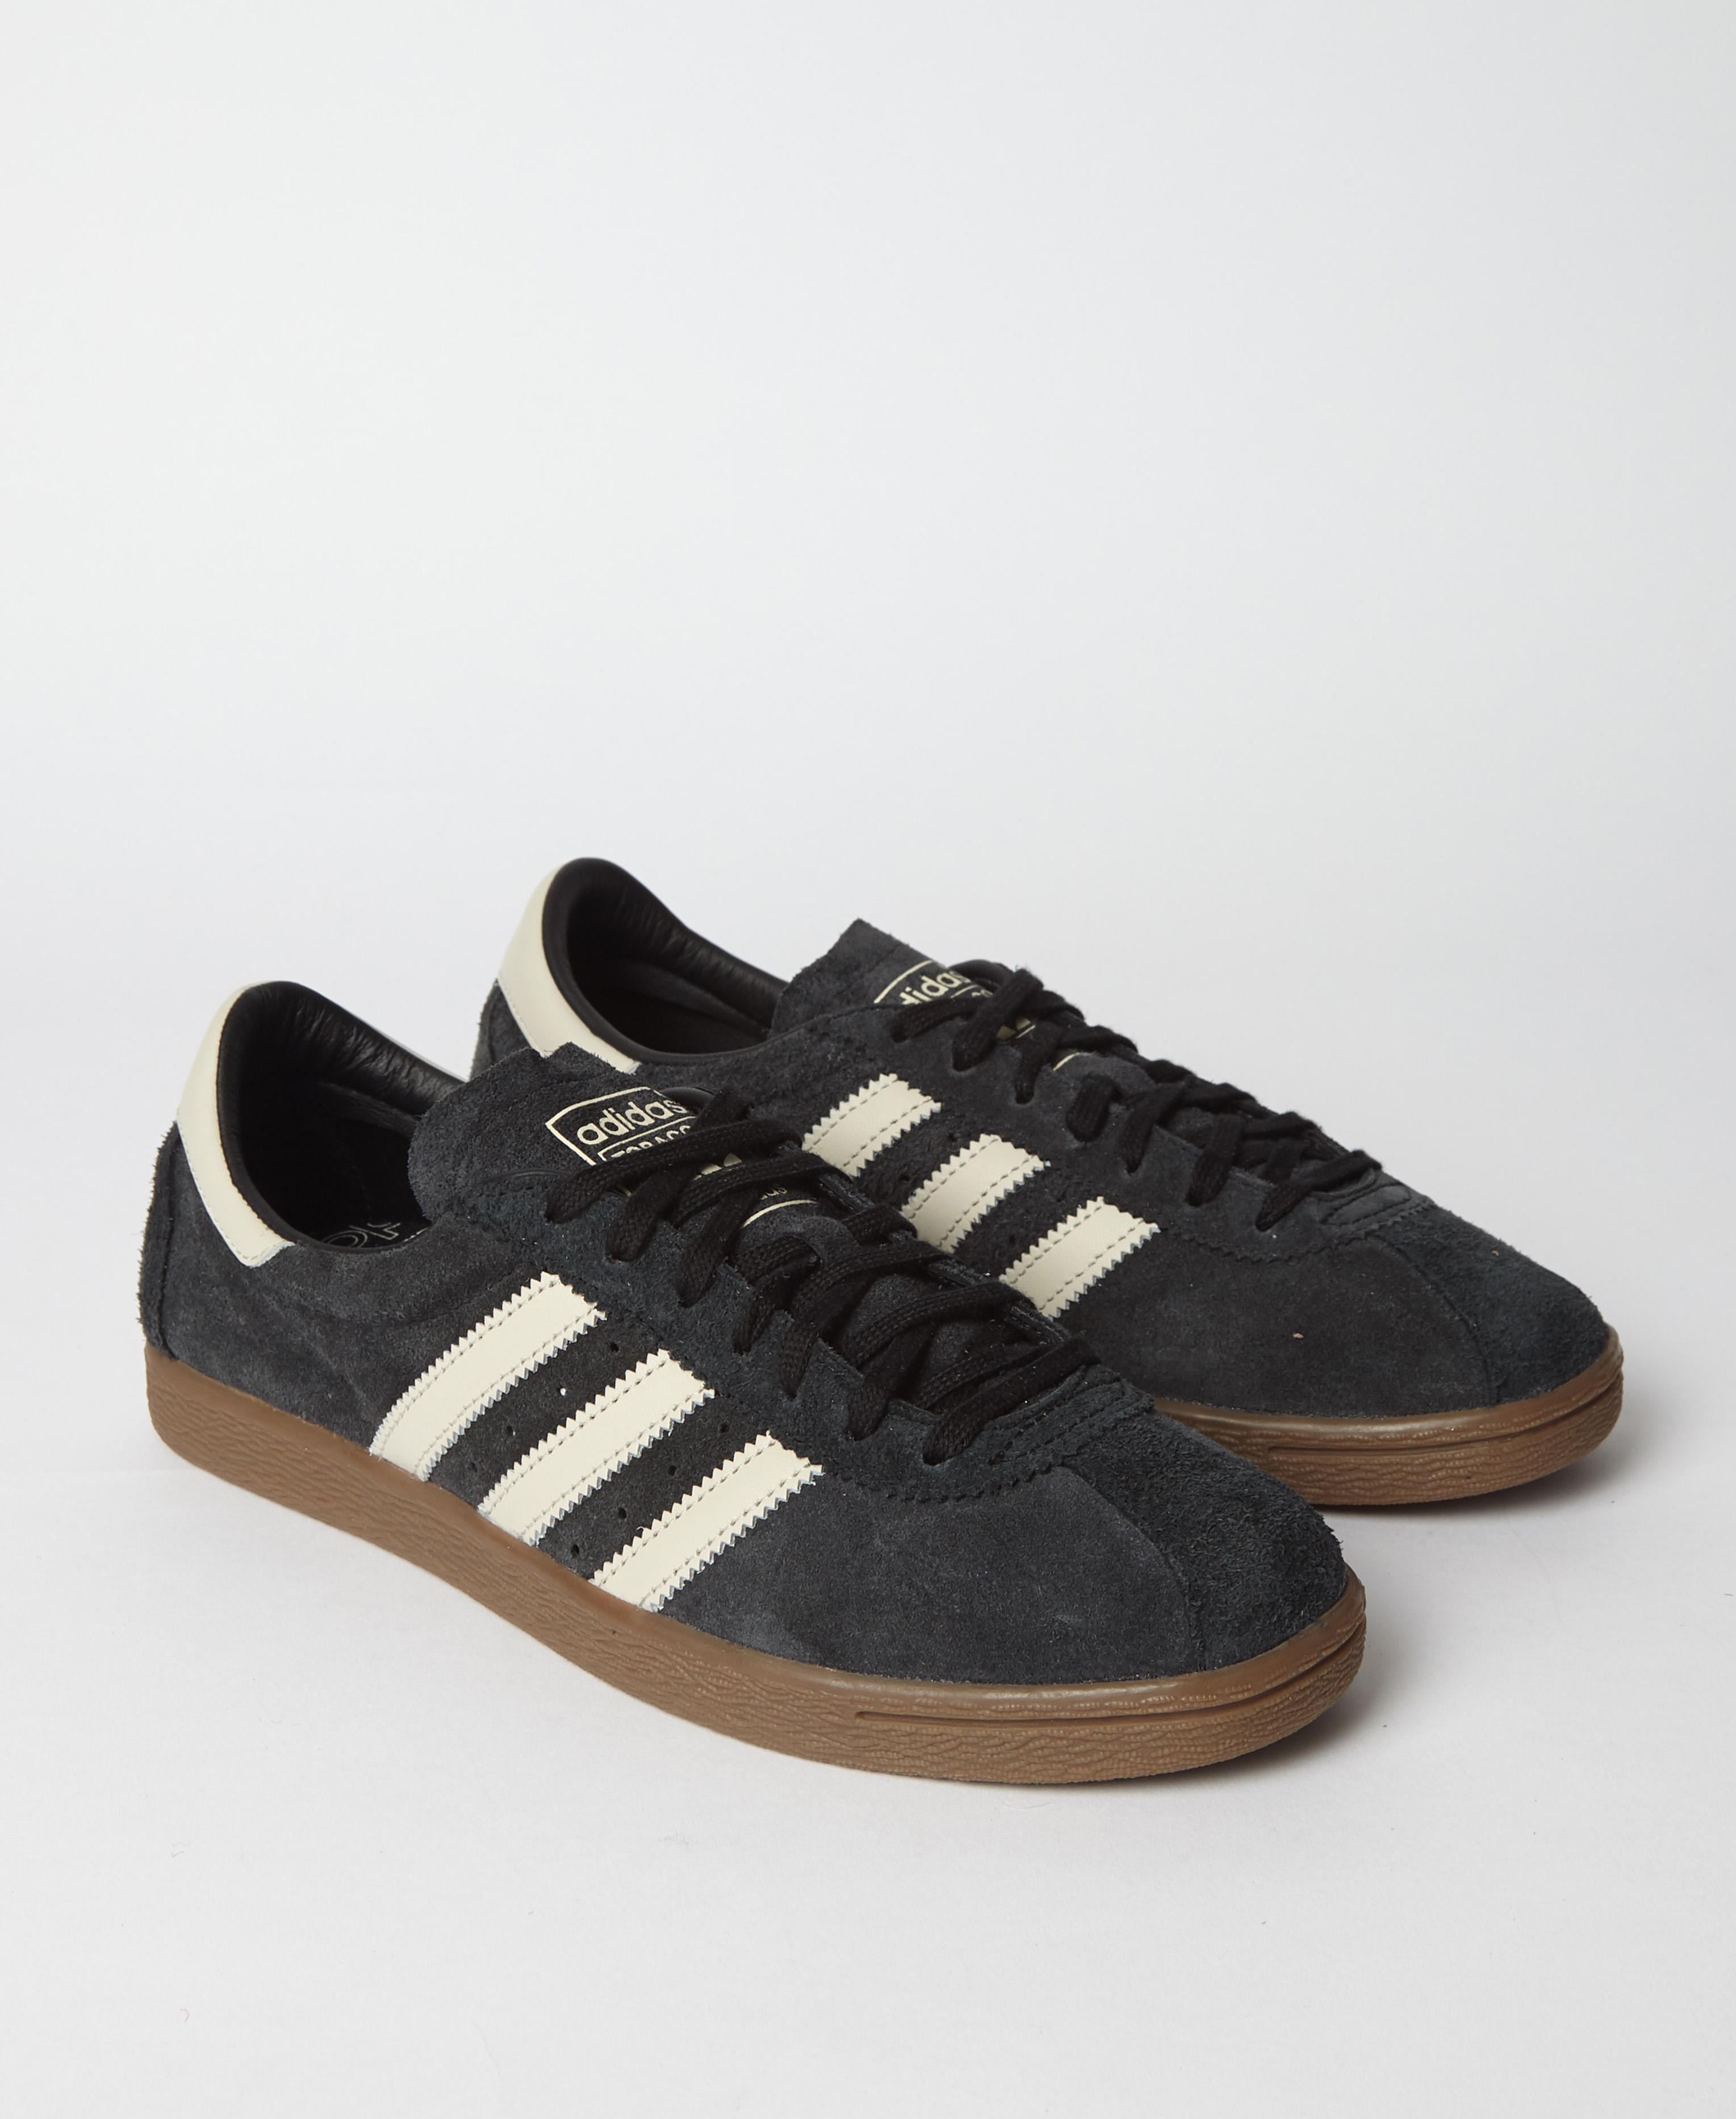 e5fd4c549b811f Lyst - adidas Tobacco Vintage in Black for Men